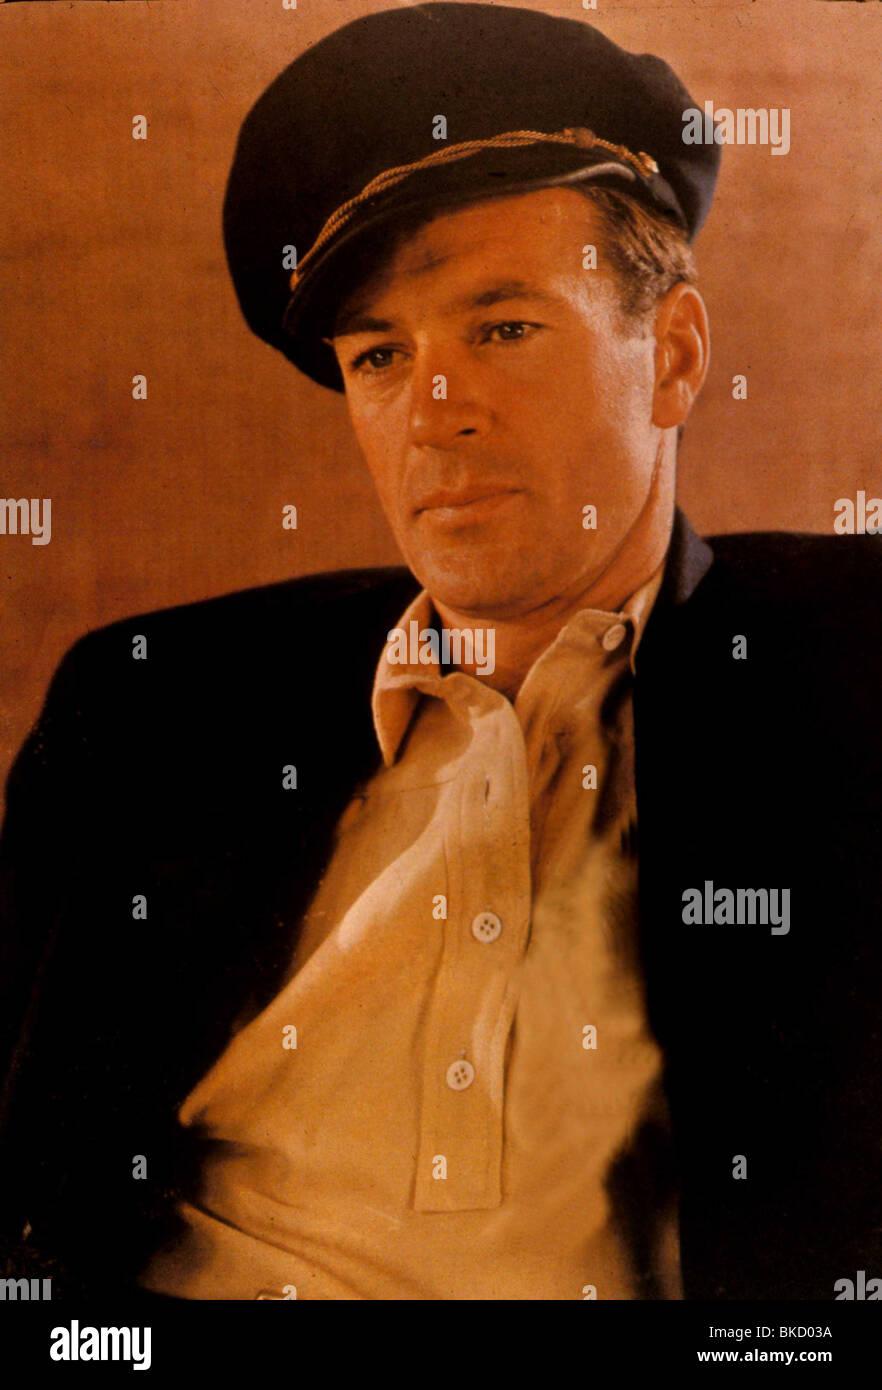 GARY COOPER PORTRAIT - Stock Image